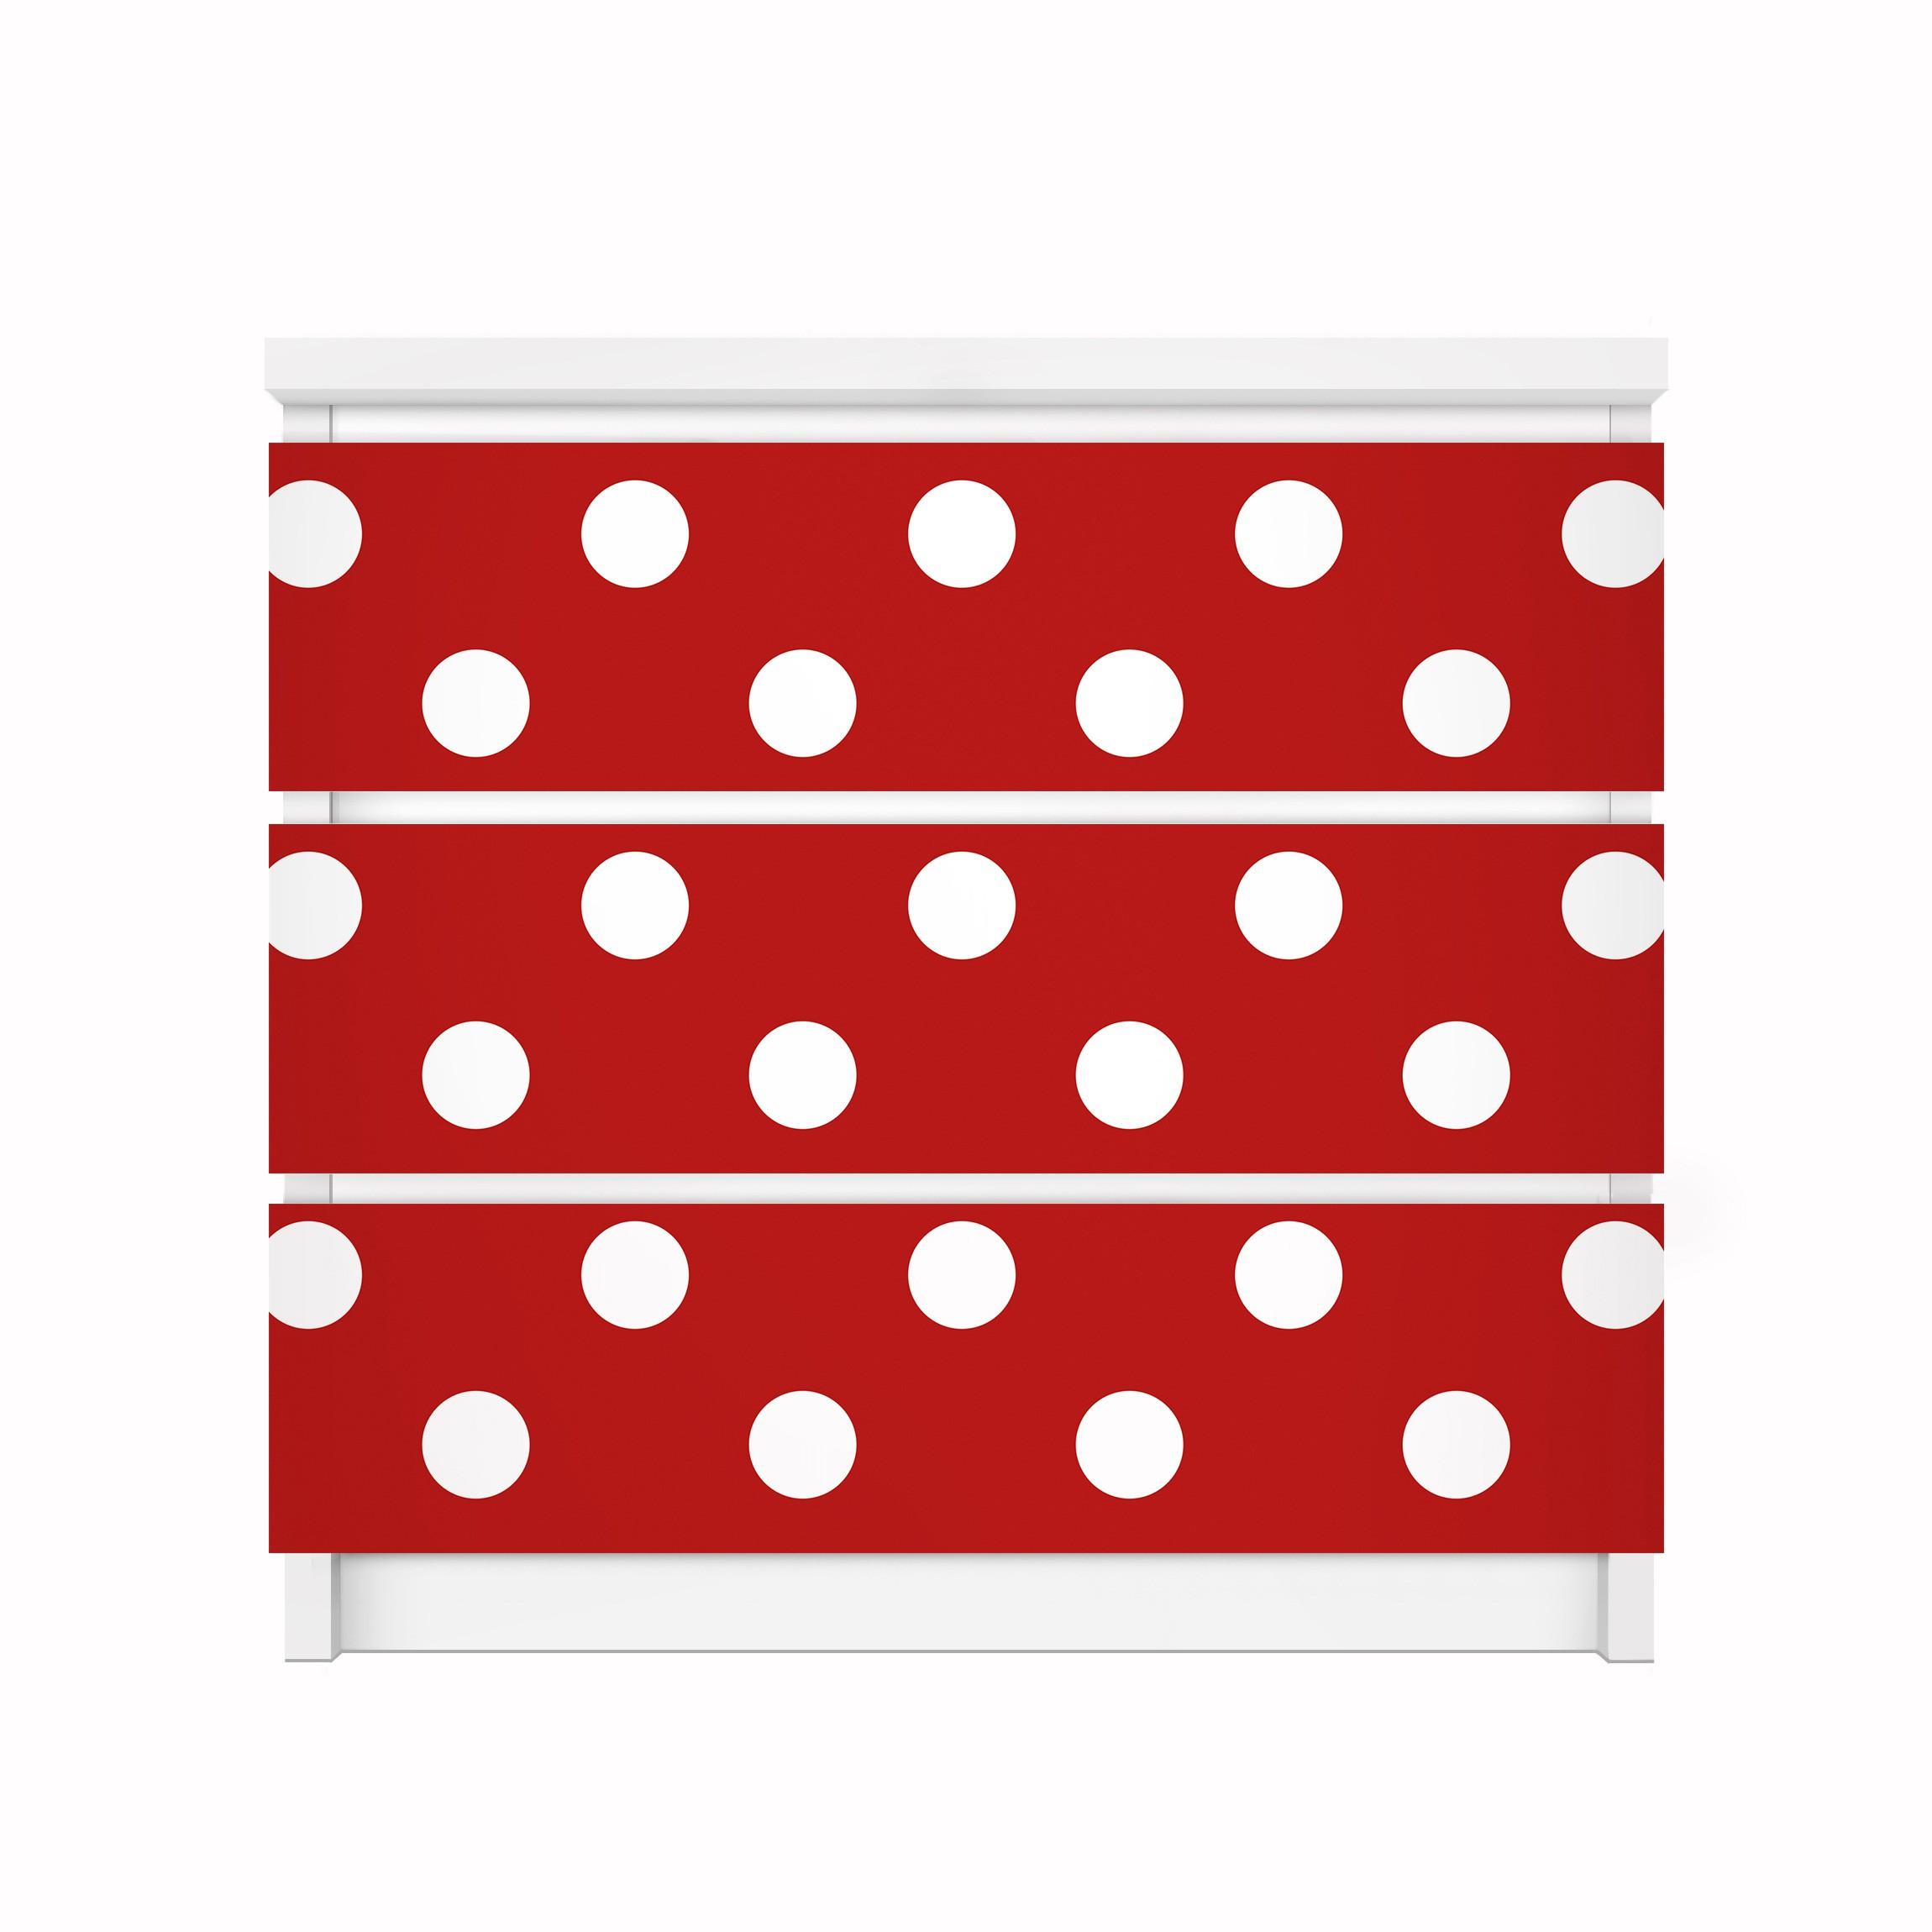 m belfolie f r ikea malm kommode klebefolie no ds92 punktdesign girly rot. Black Bedroom Furniture Sets. Home Design Ideas